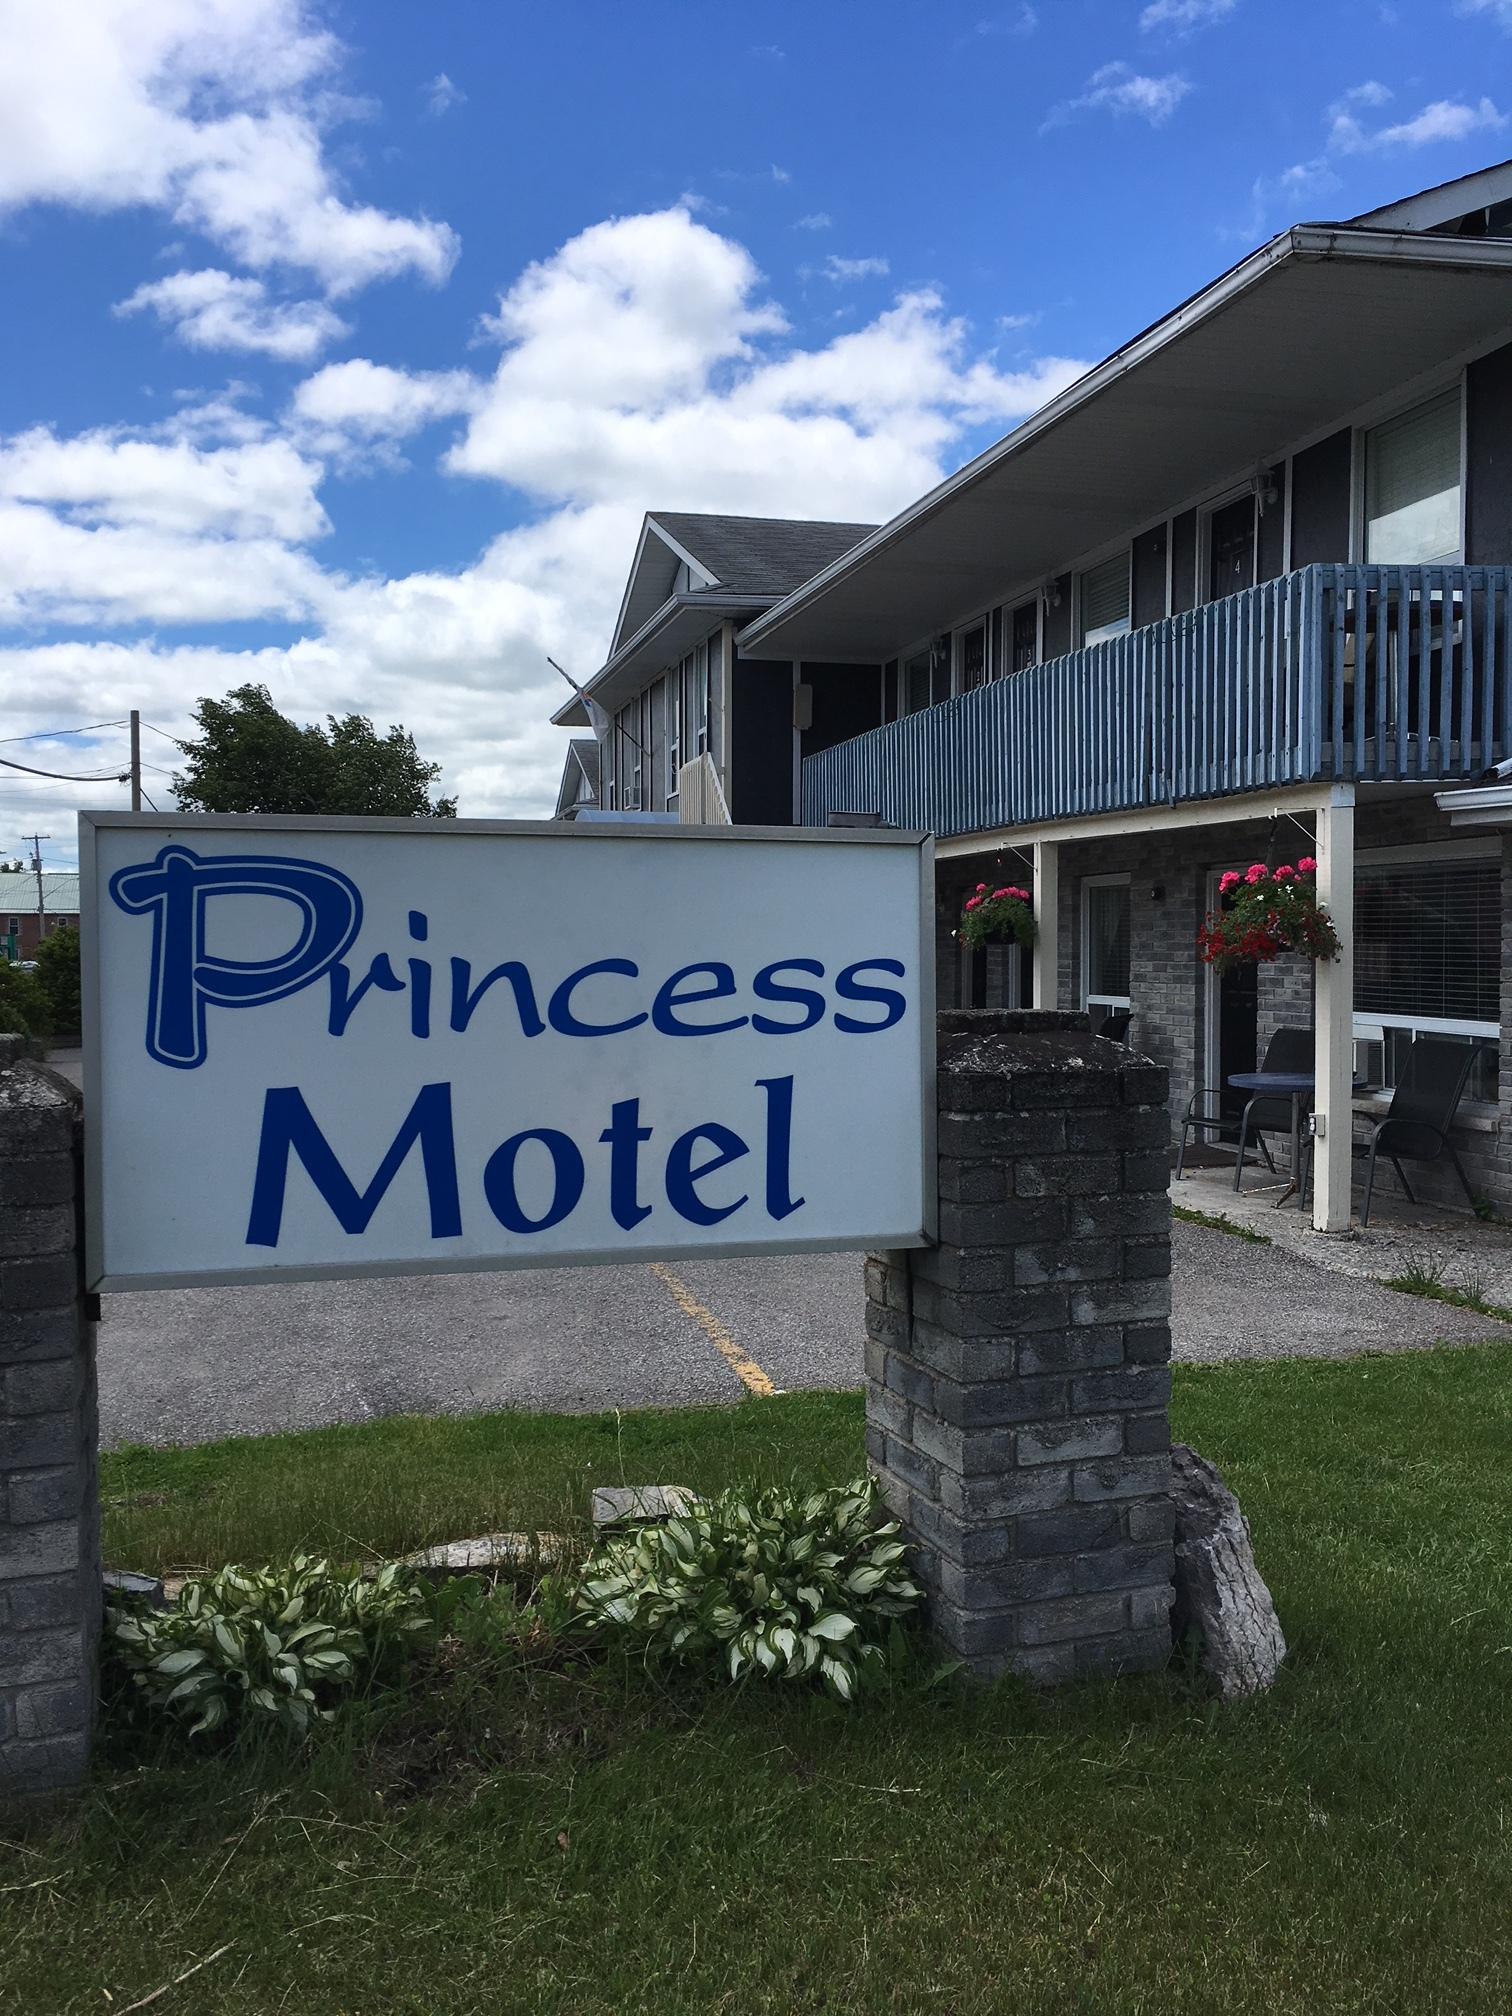 Princess Motel.JPG